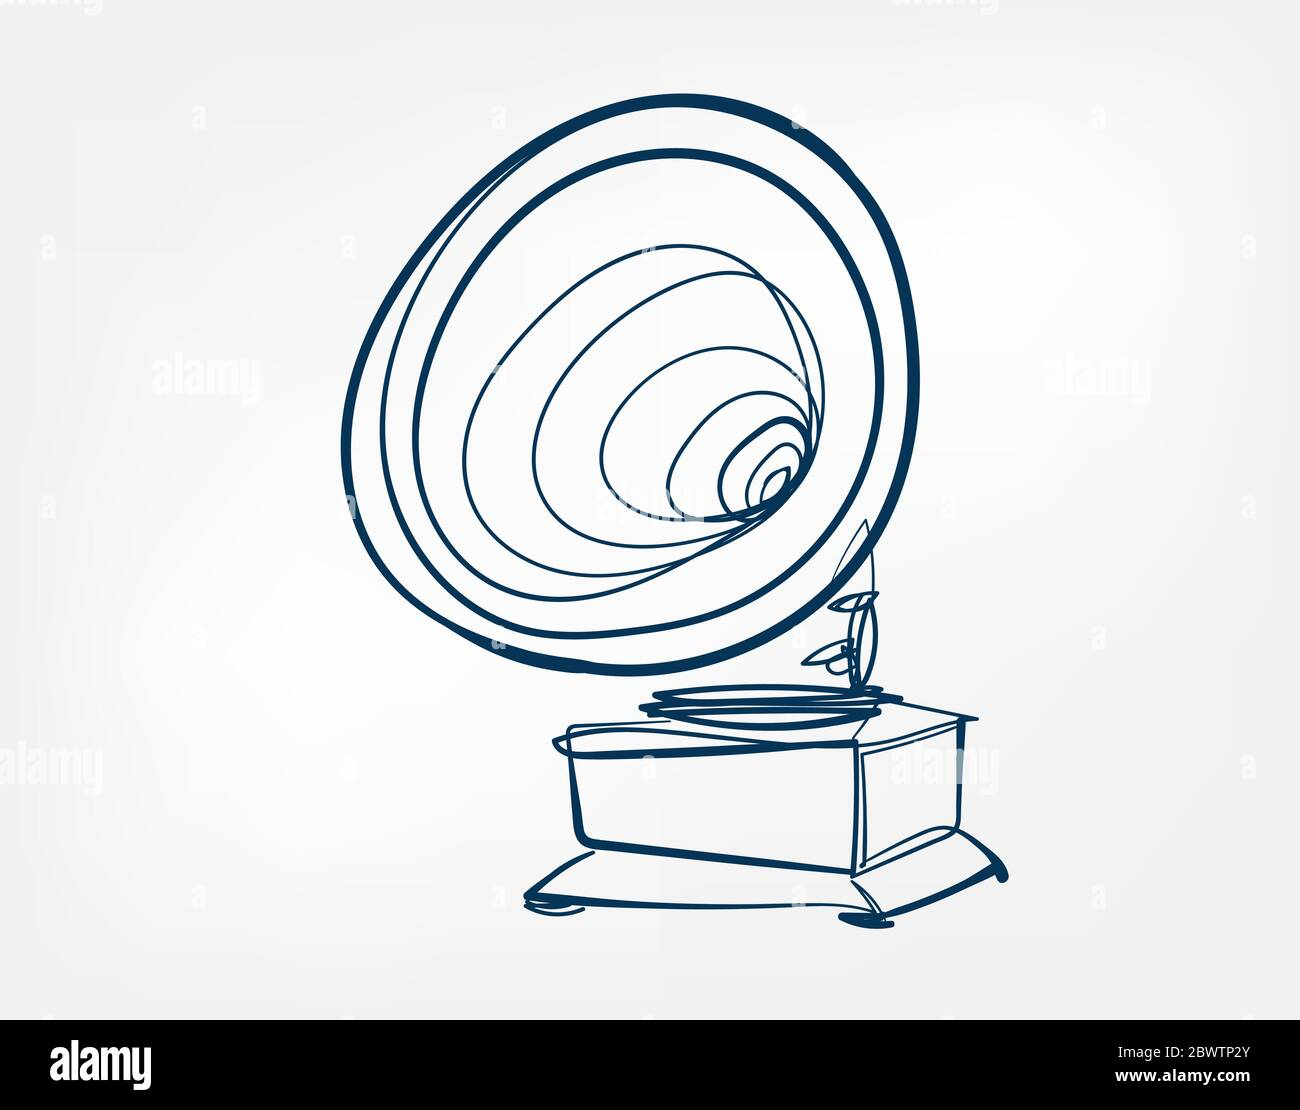 gramophone vector art line isolated doodle stock vector image art alamy alamy